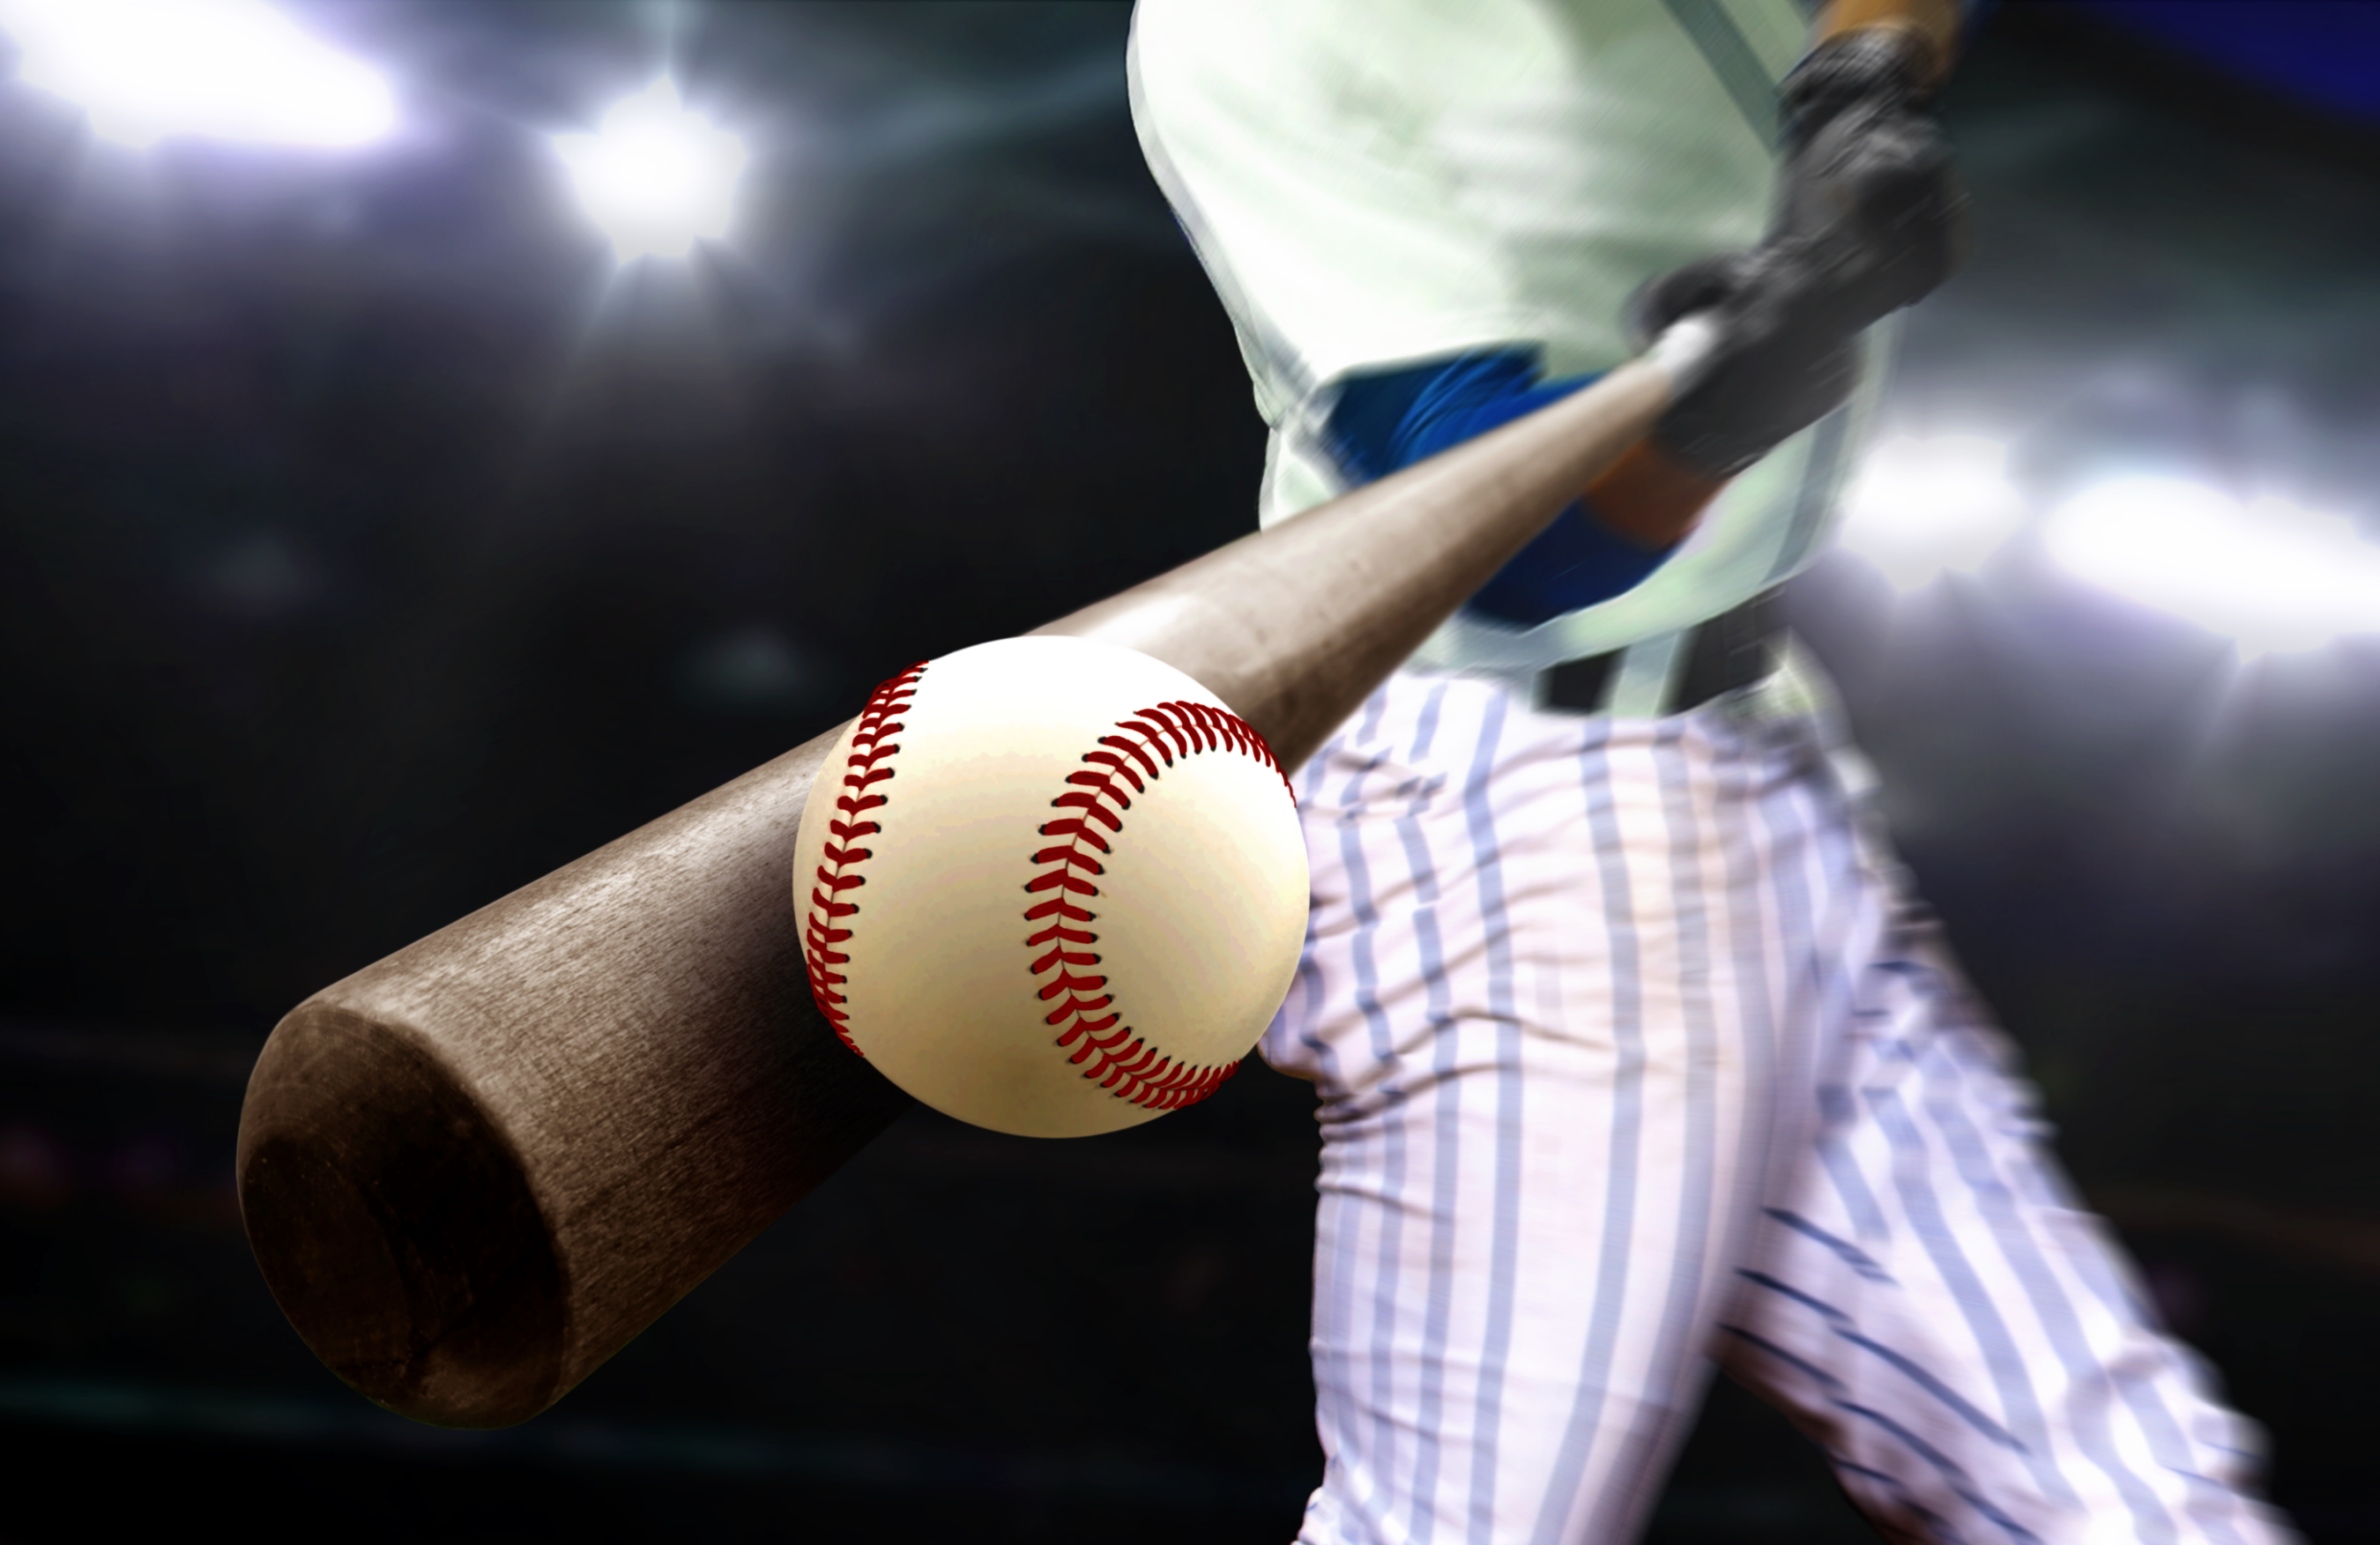 Baseball player swing hitting ball with bat in close up under stadium spotlights